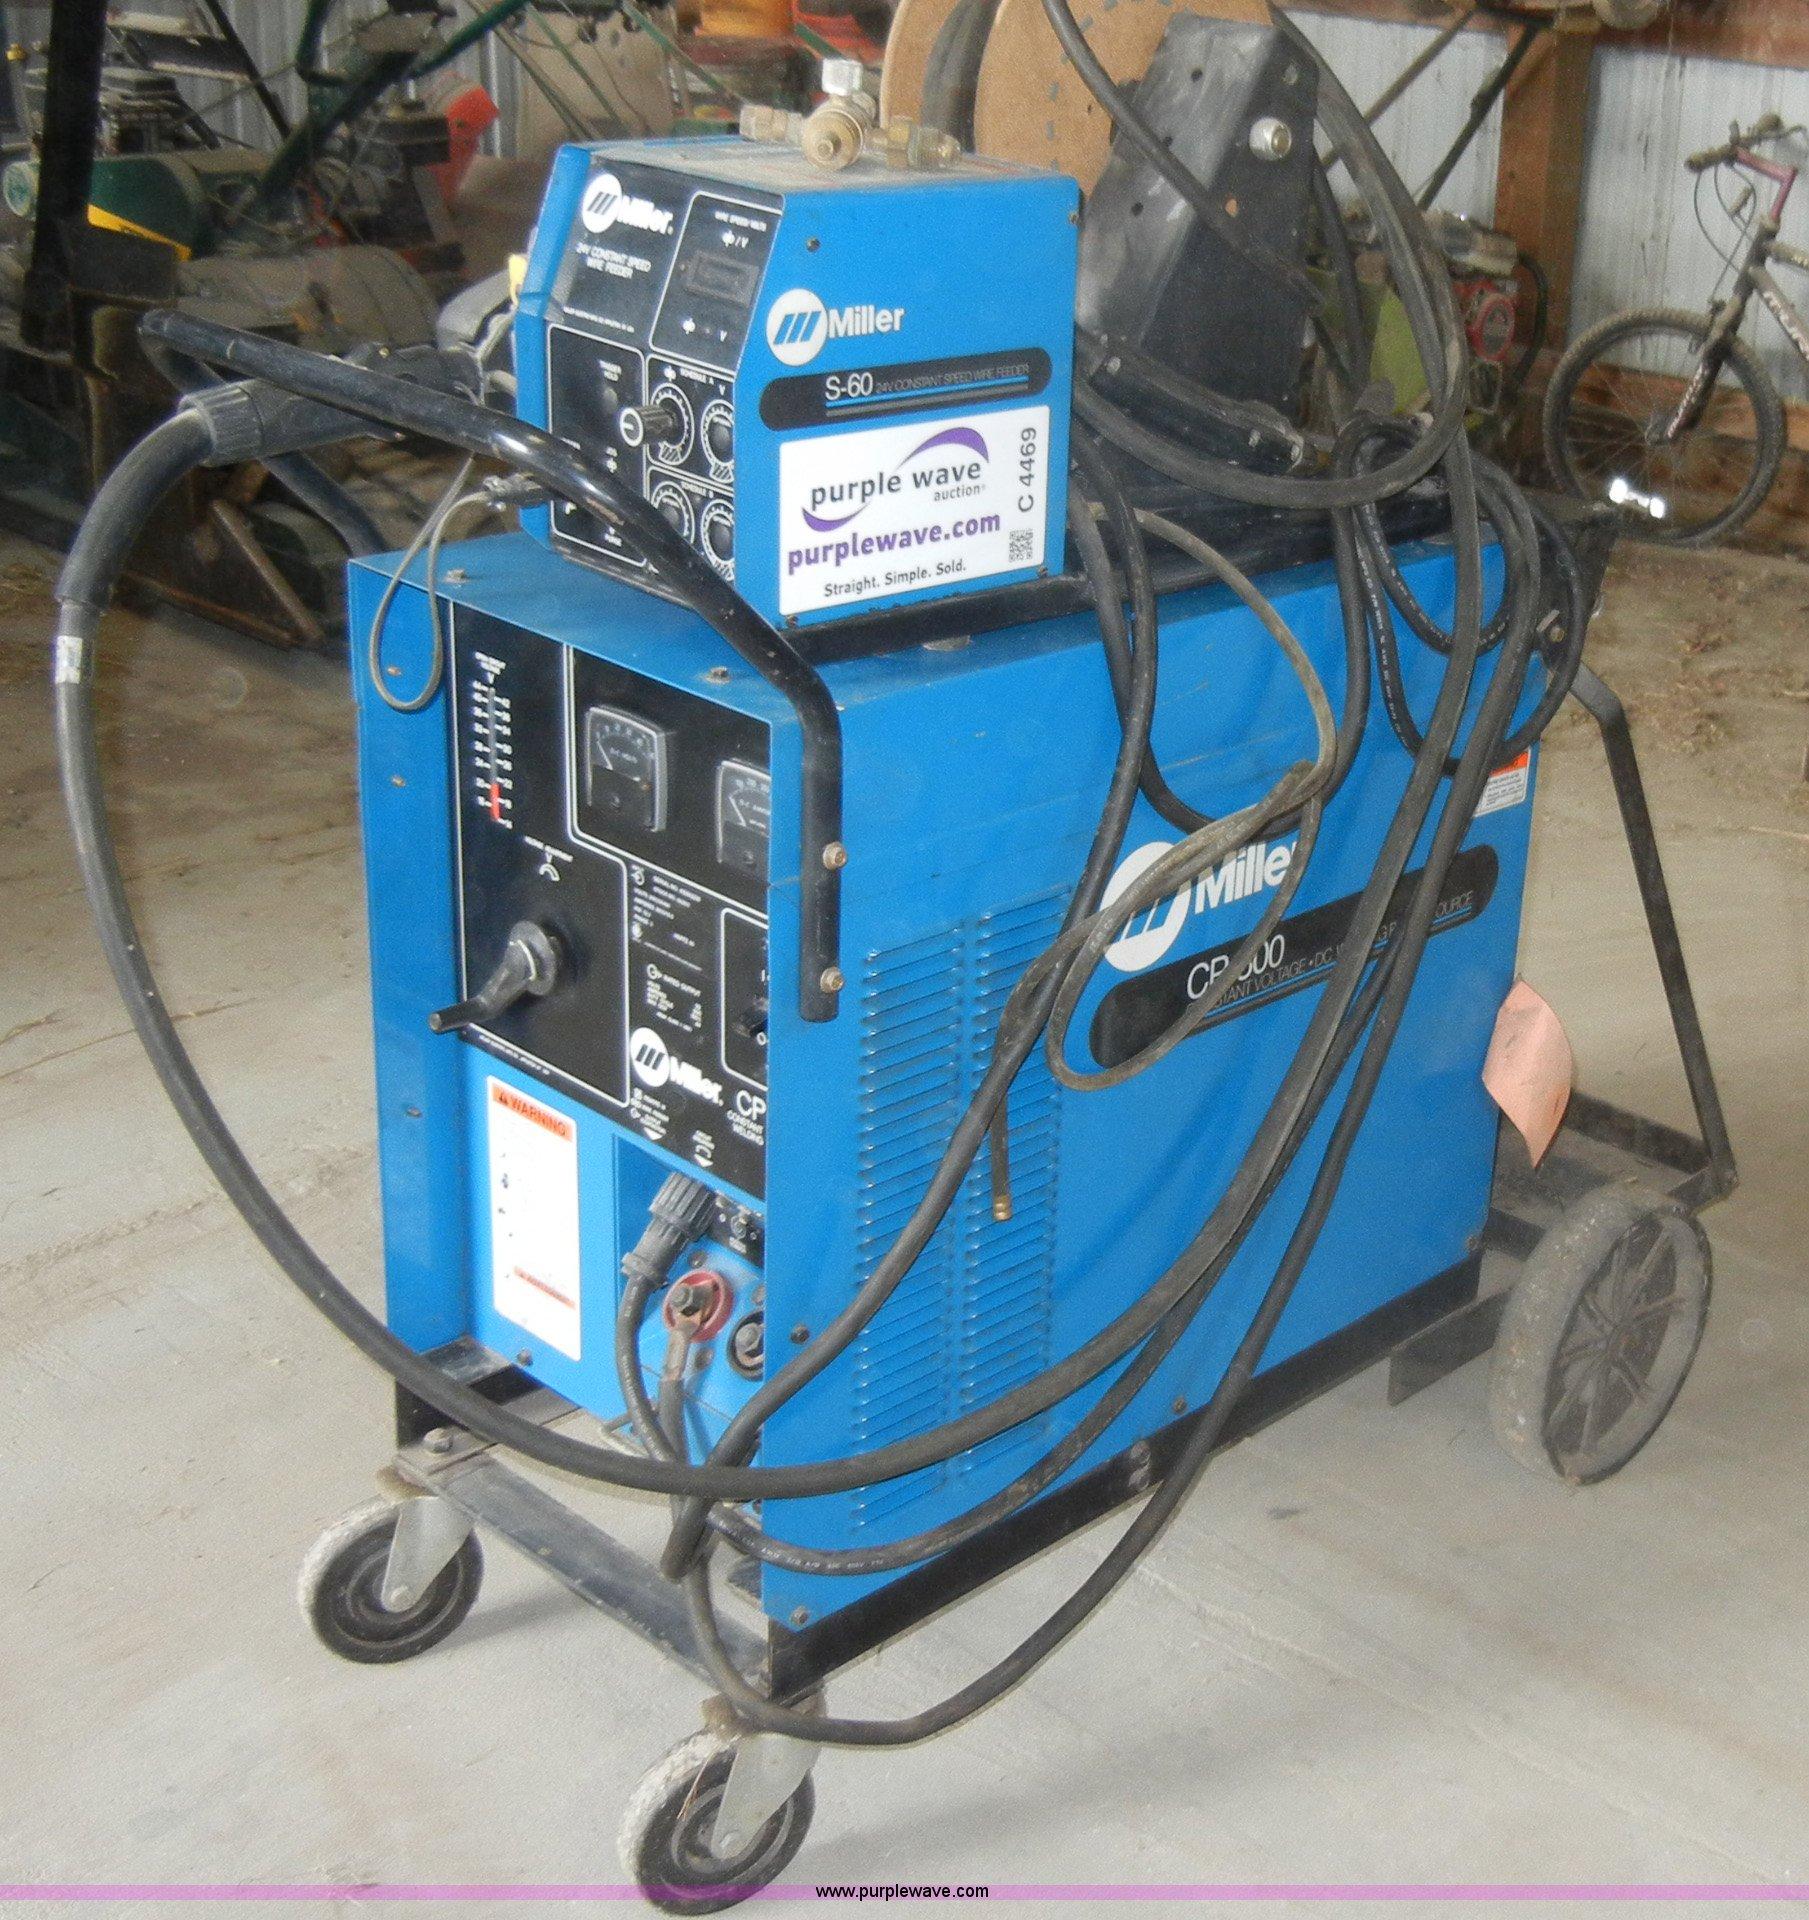 Miller S60 constant speed wire feed arc DC welder | Item C44...